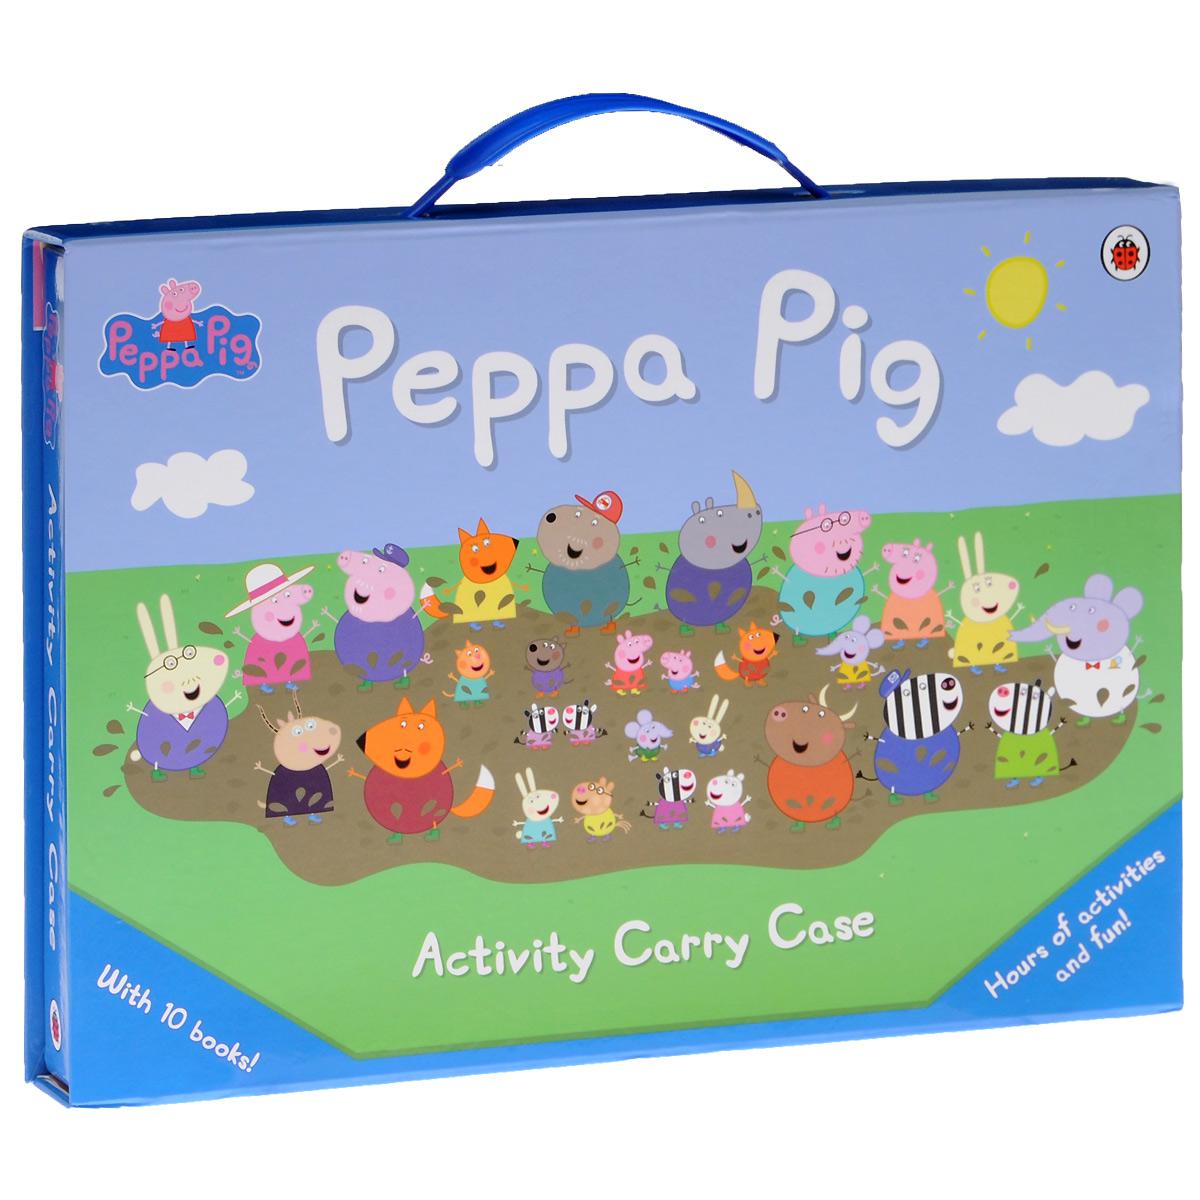 Peppa Pig: Activity Carry Case (комплект из 10 книг) play big конструктор peppa pig железнодорожная станция